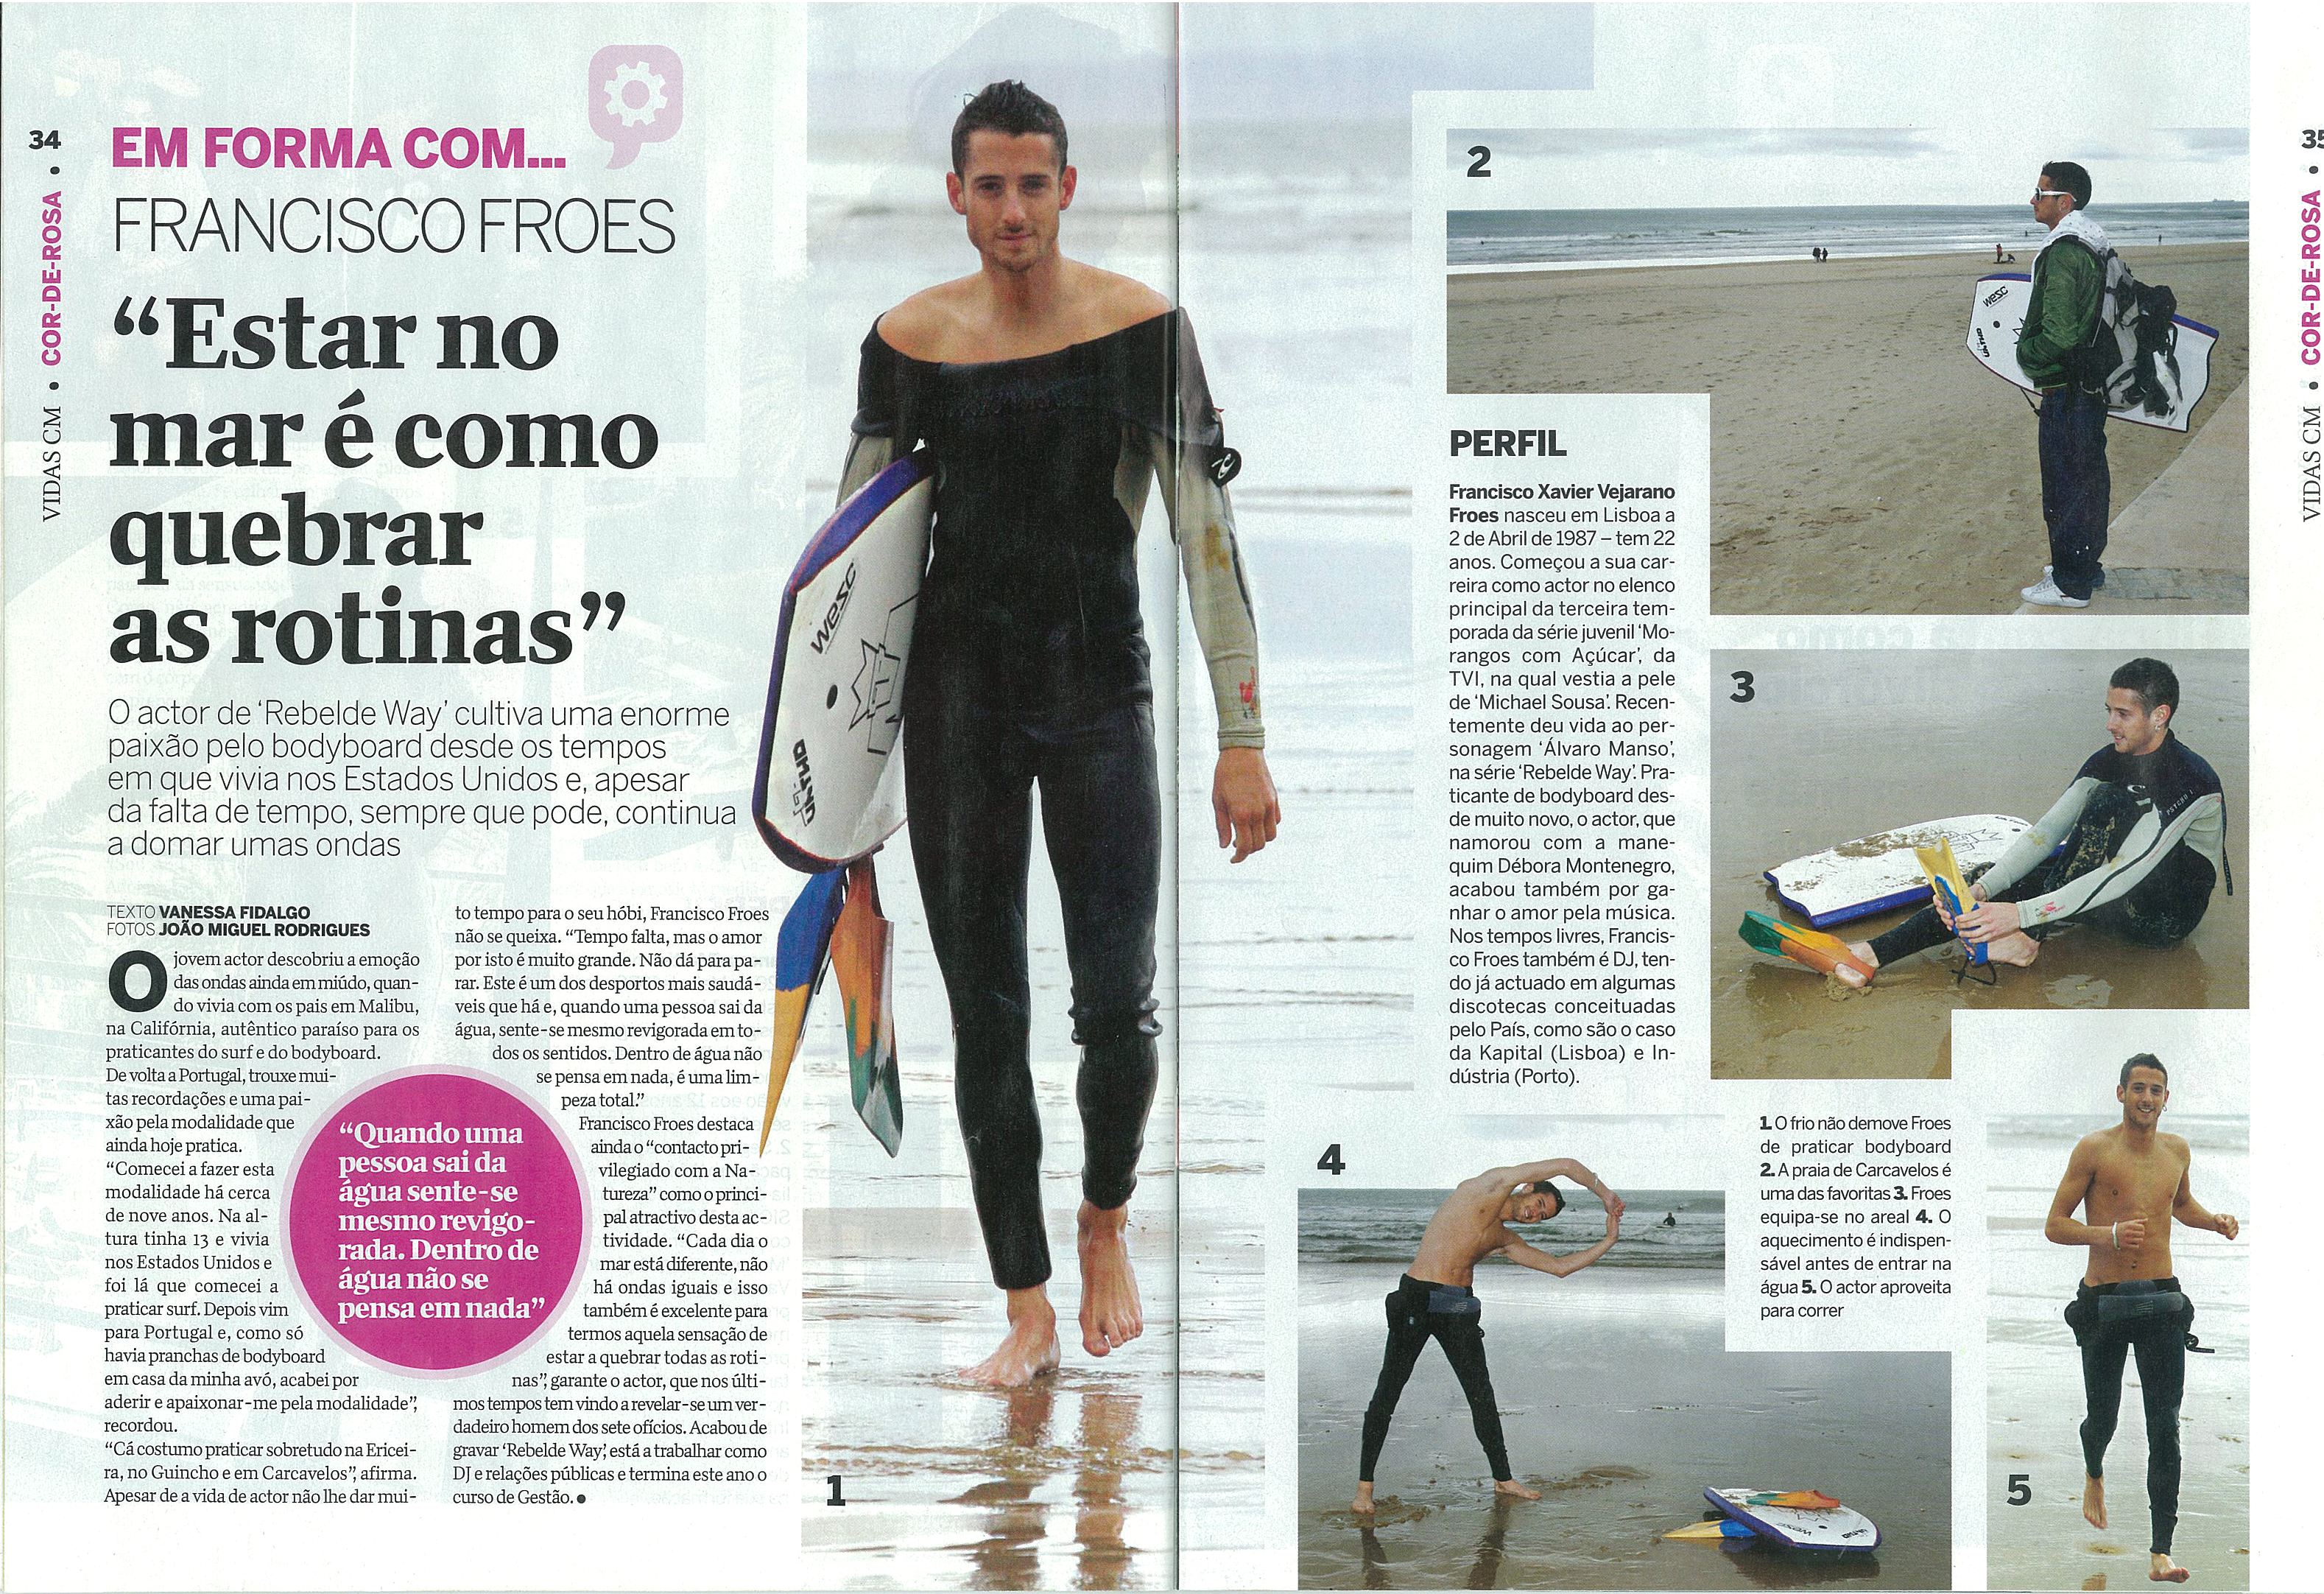 VIDAS Magazine